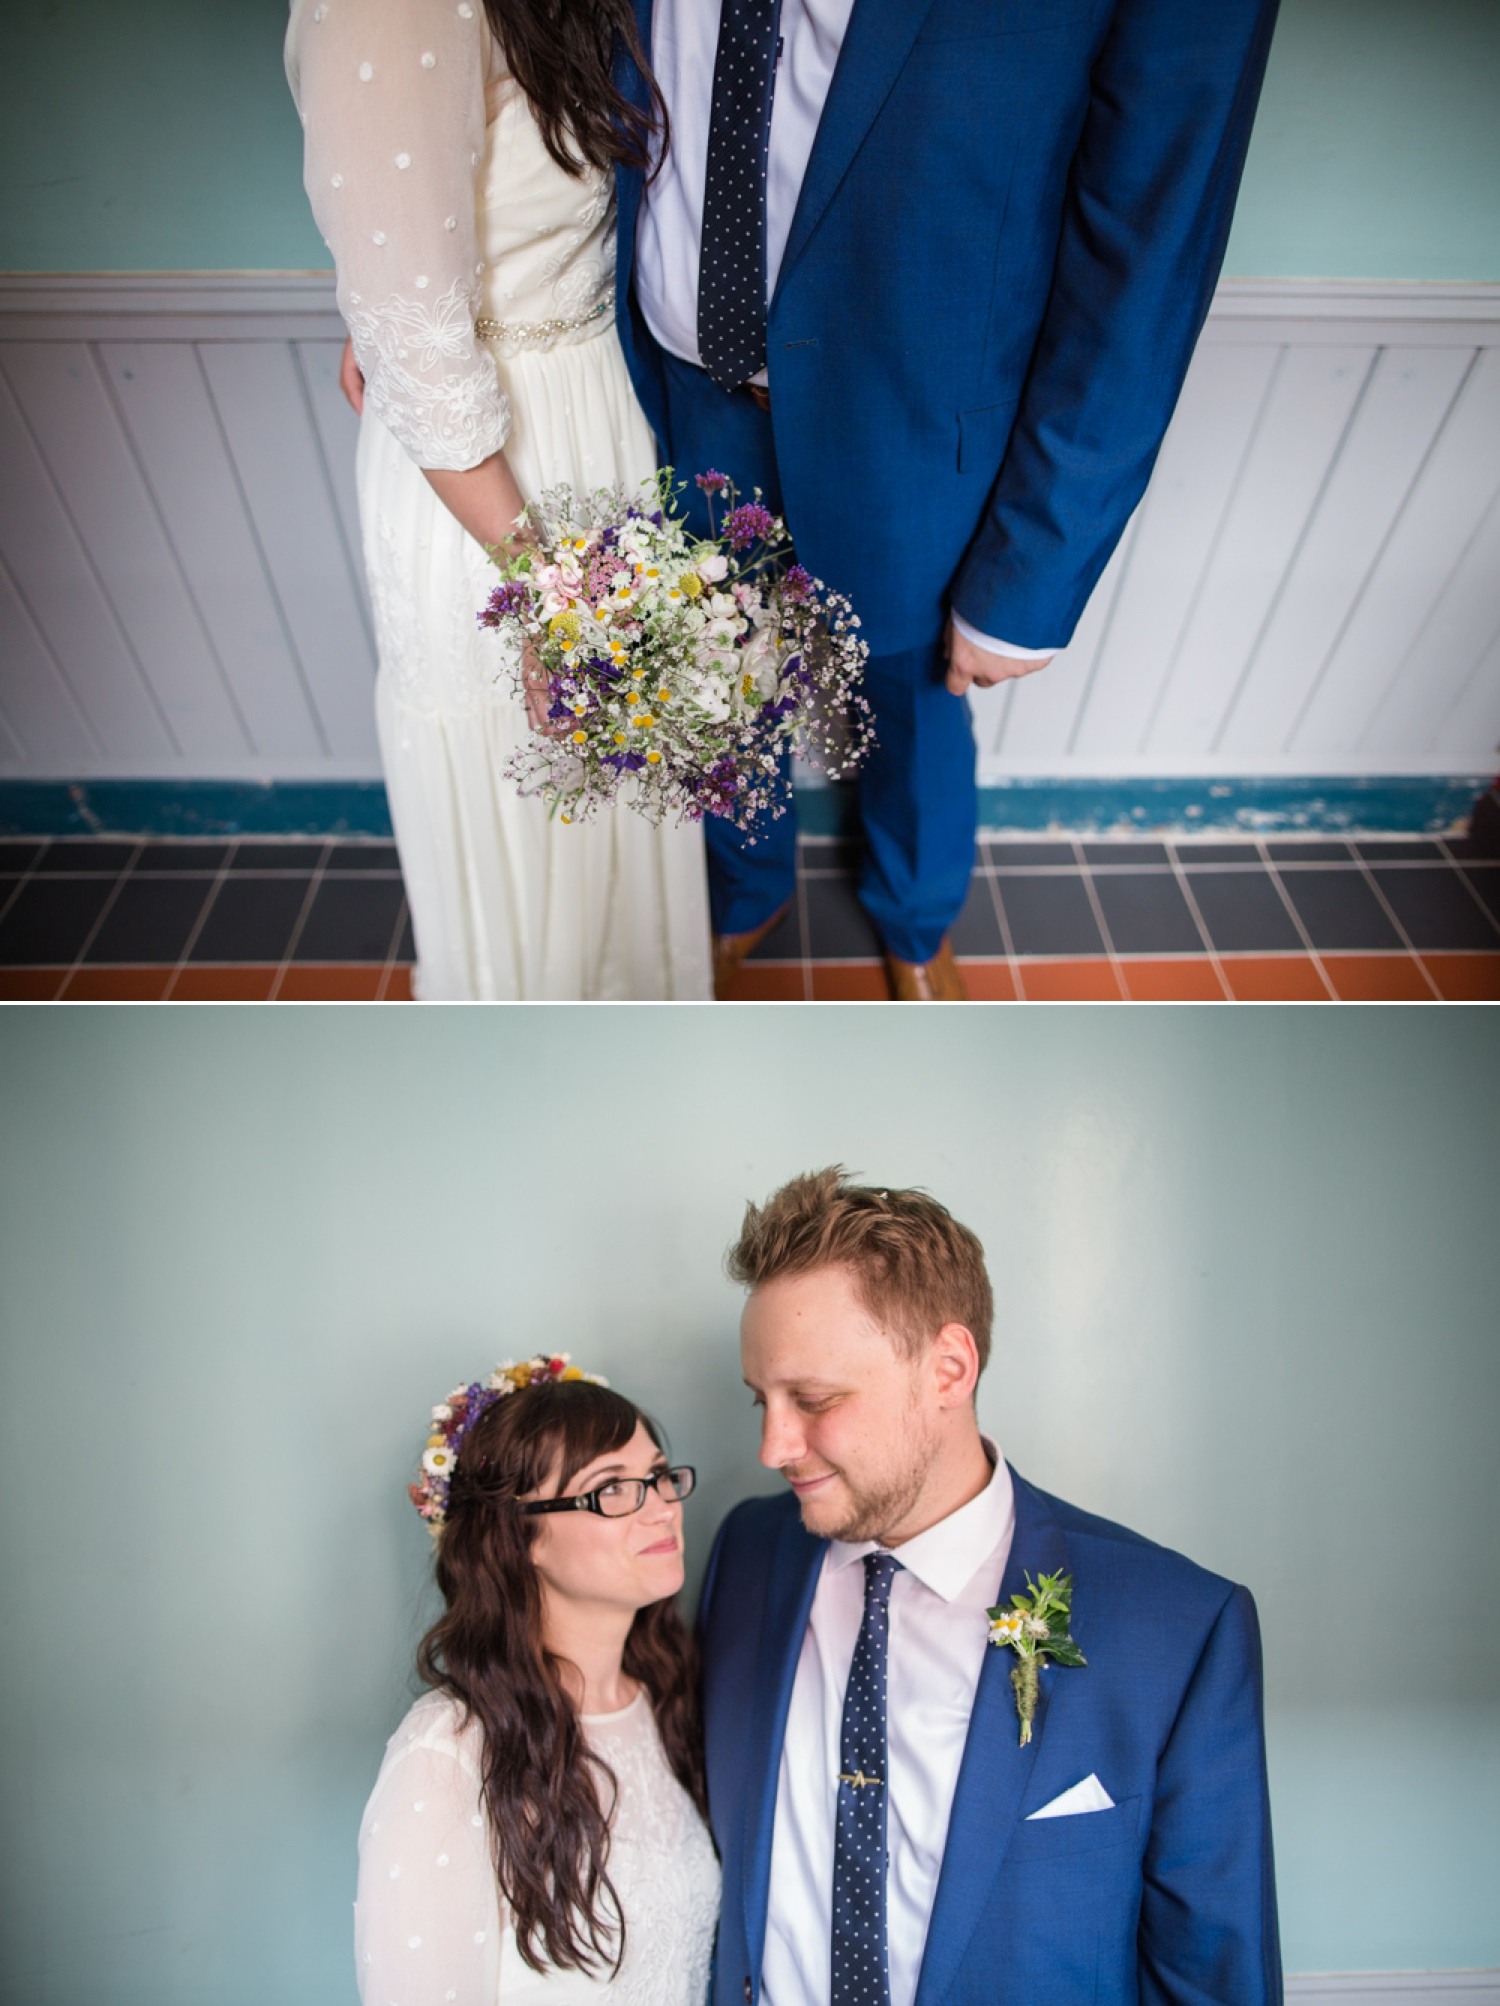 Somerset Wedding Photographer Elly & Liam_0022.jpg